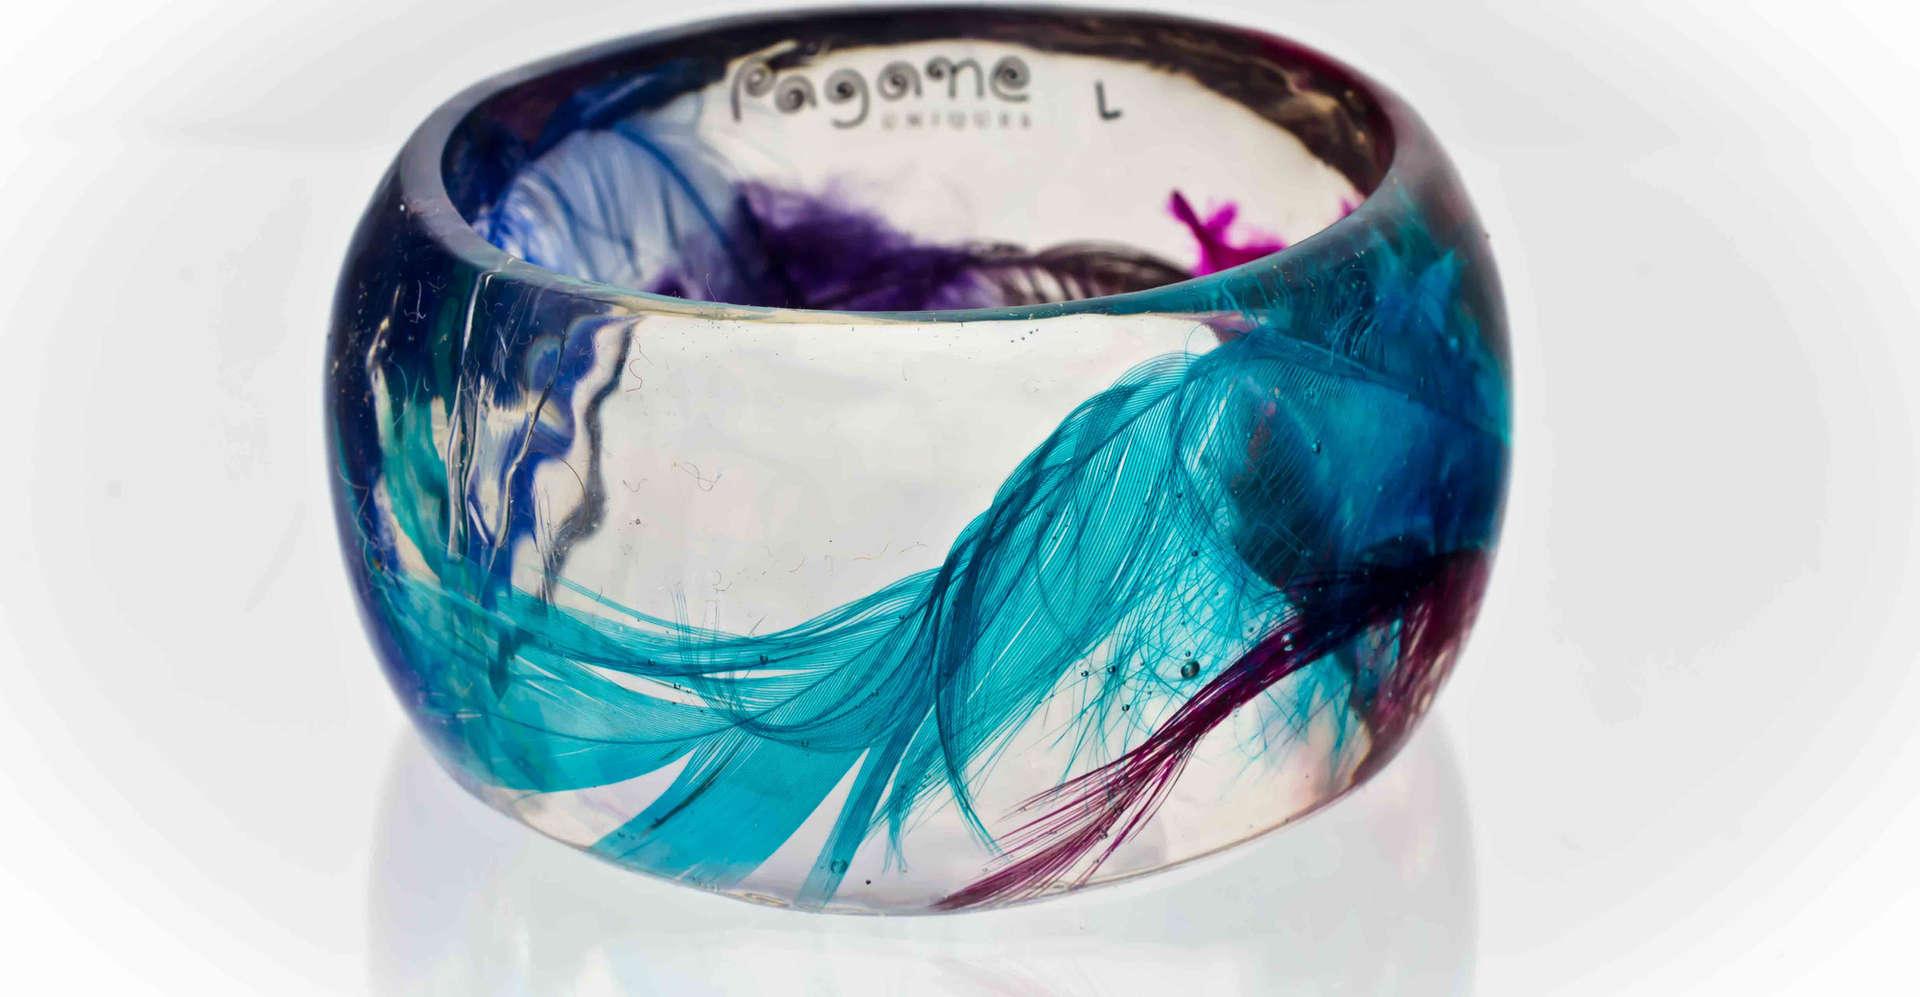 Resin Bangles Bracelets PAGANE uniques (